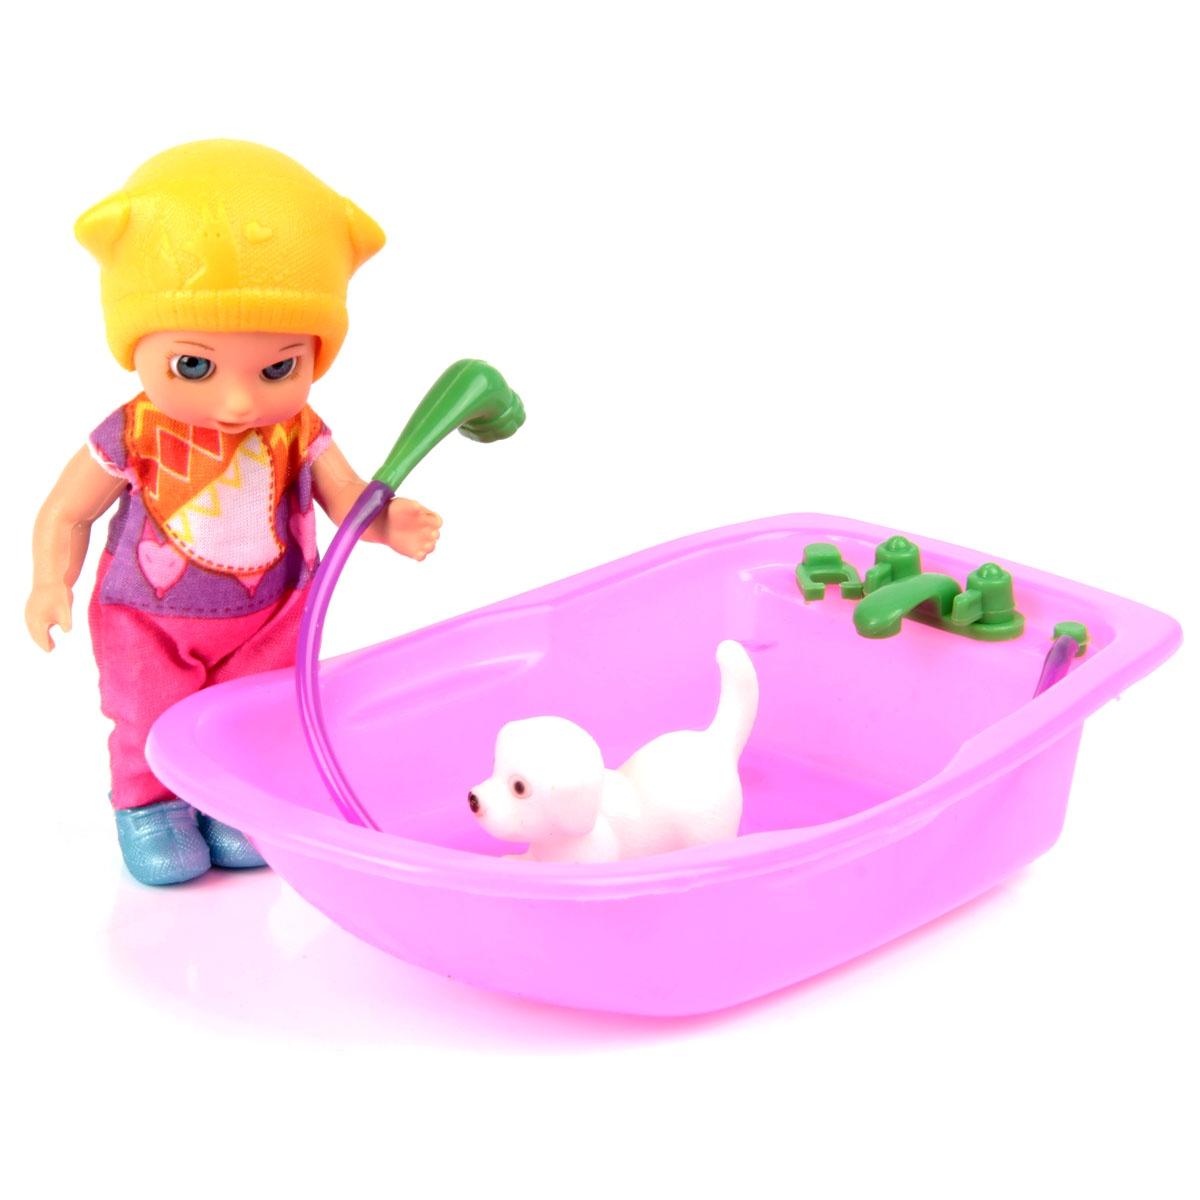 Кукла Изабелла veld co кукла цвет одежды бежевый розовый